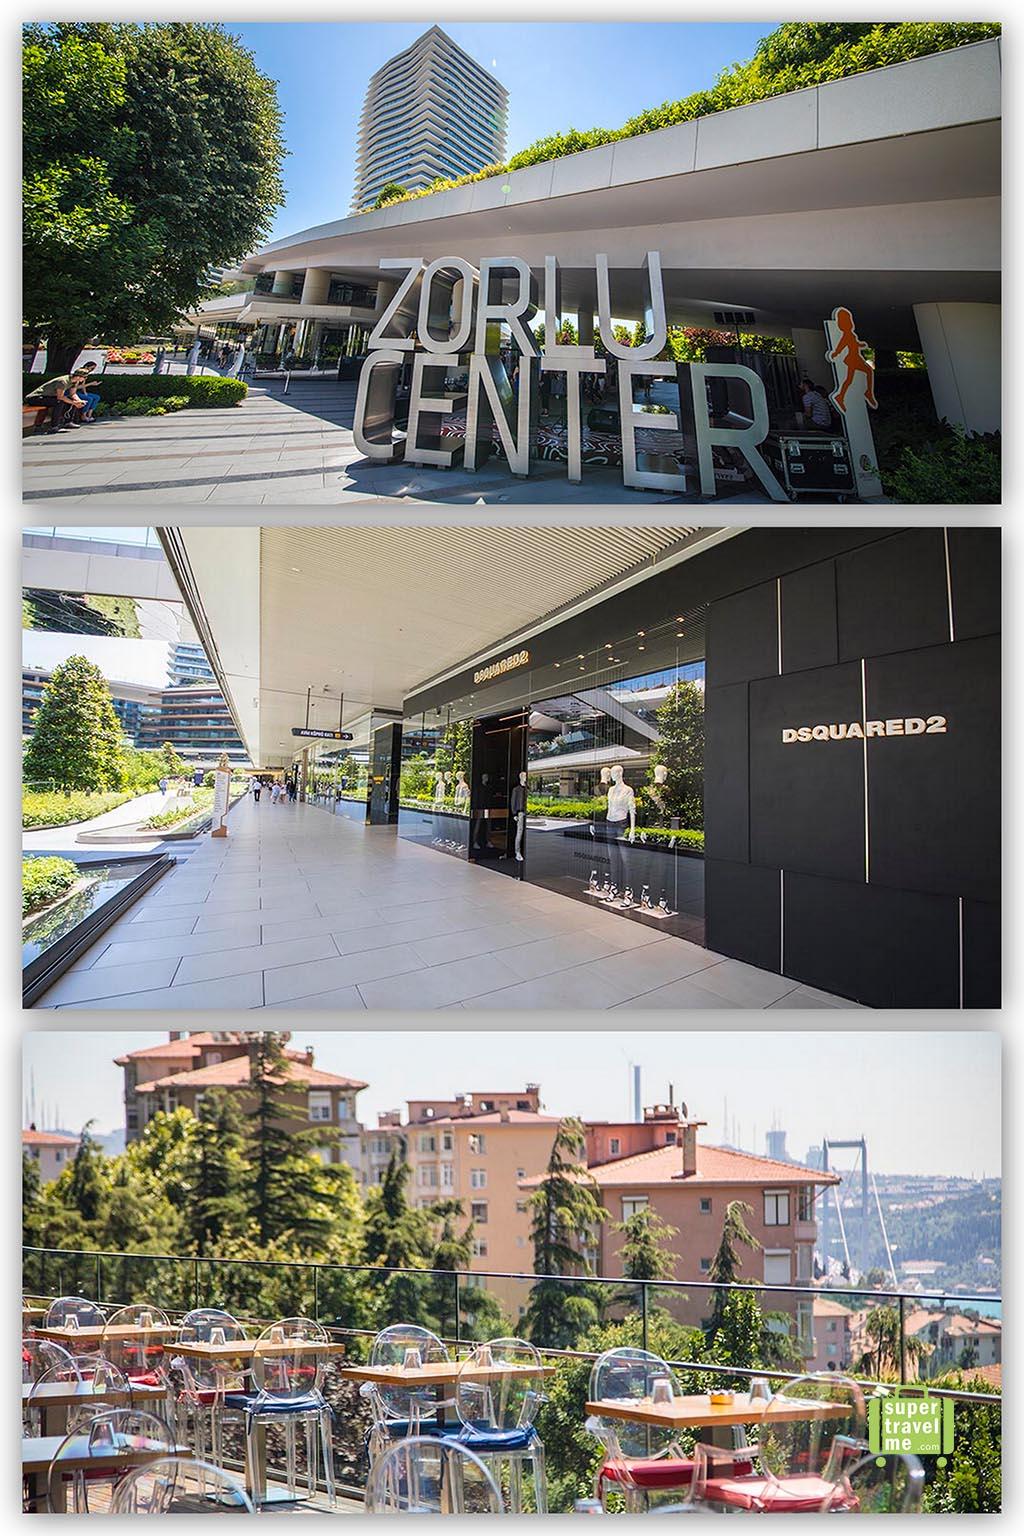 Zorlu Centre, Istanbul